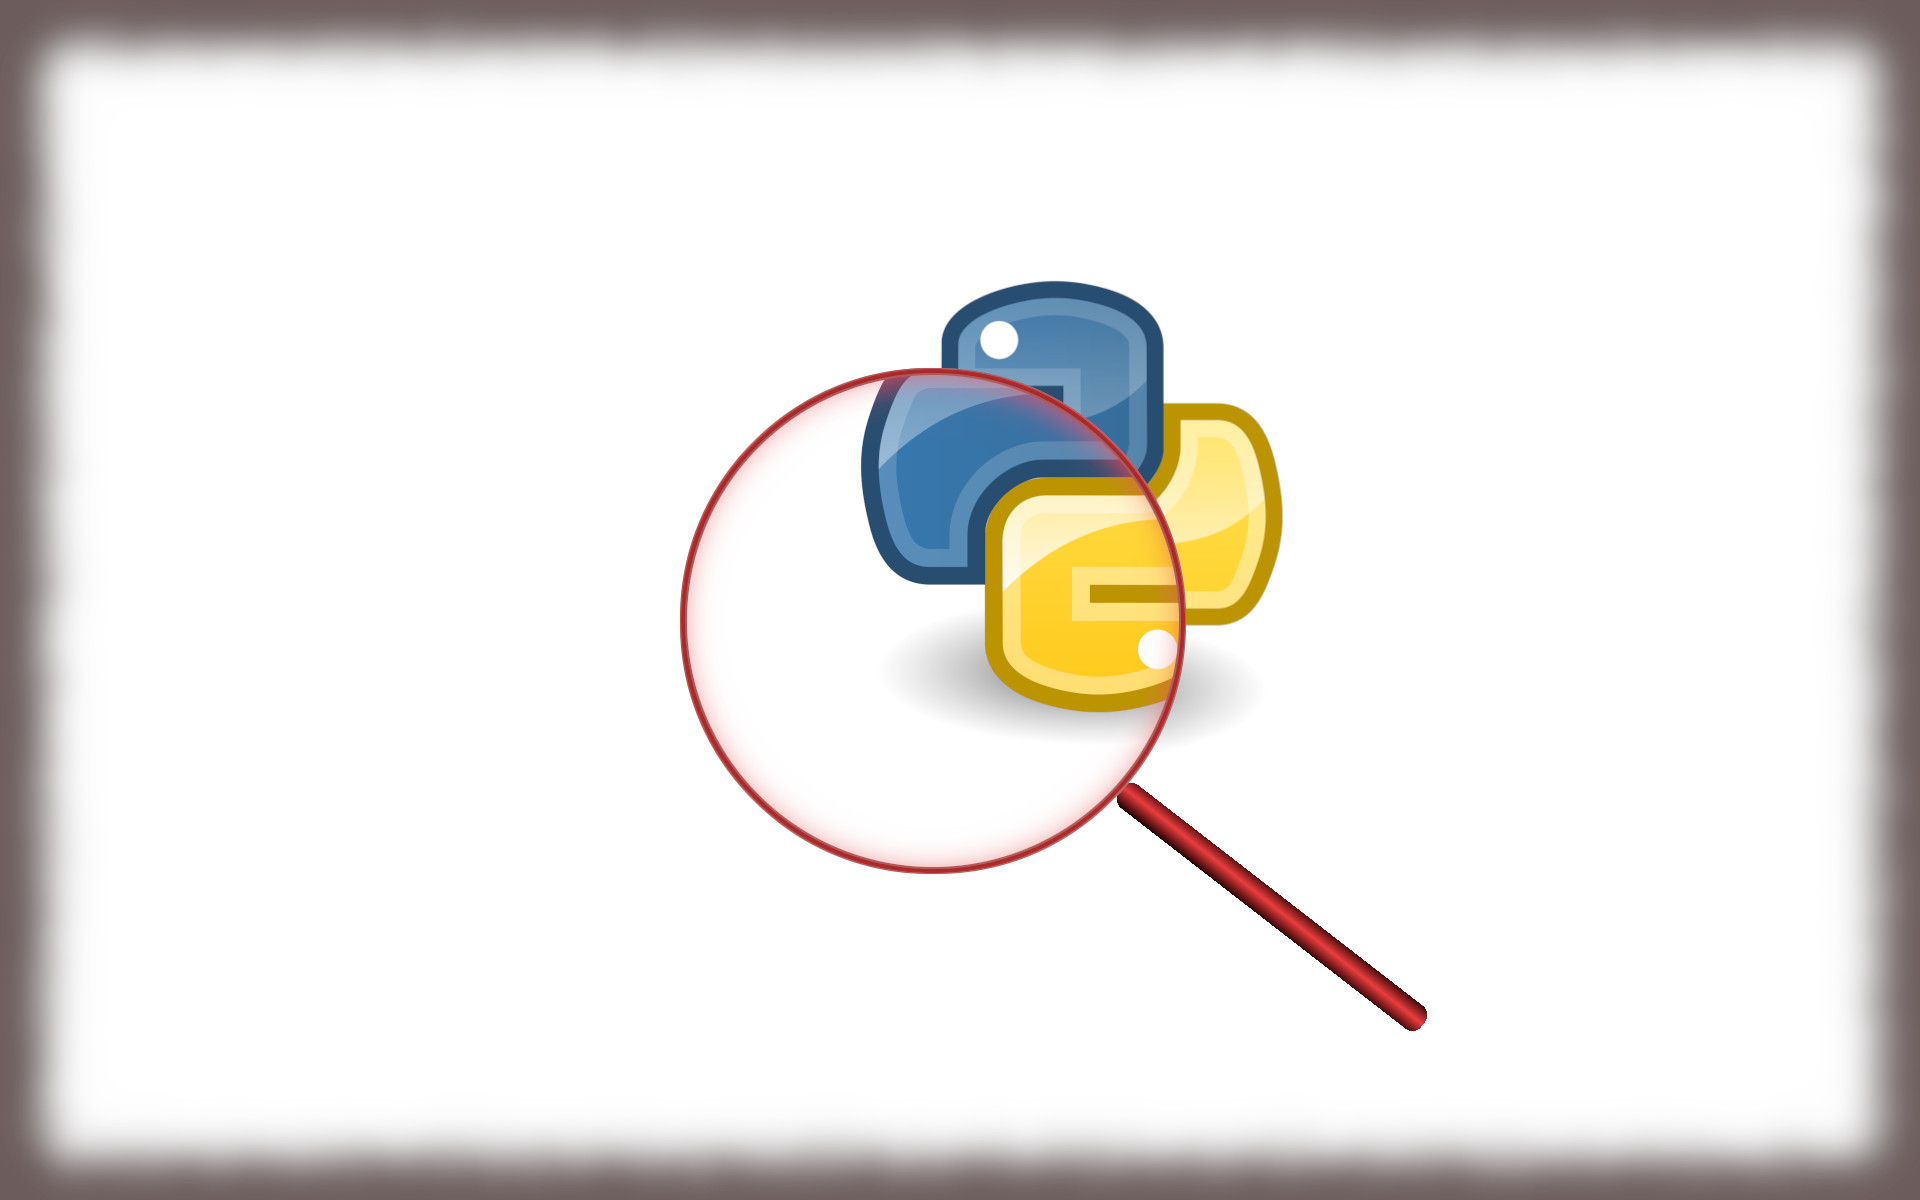 Inspecting python tools using eBPF